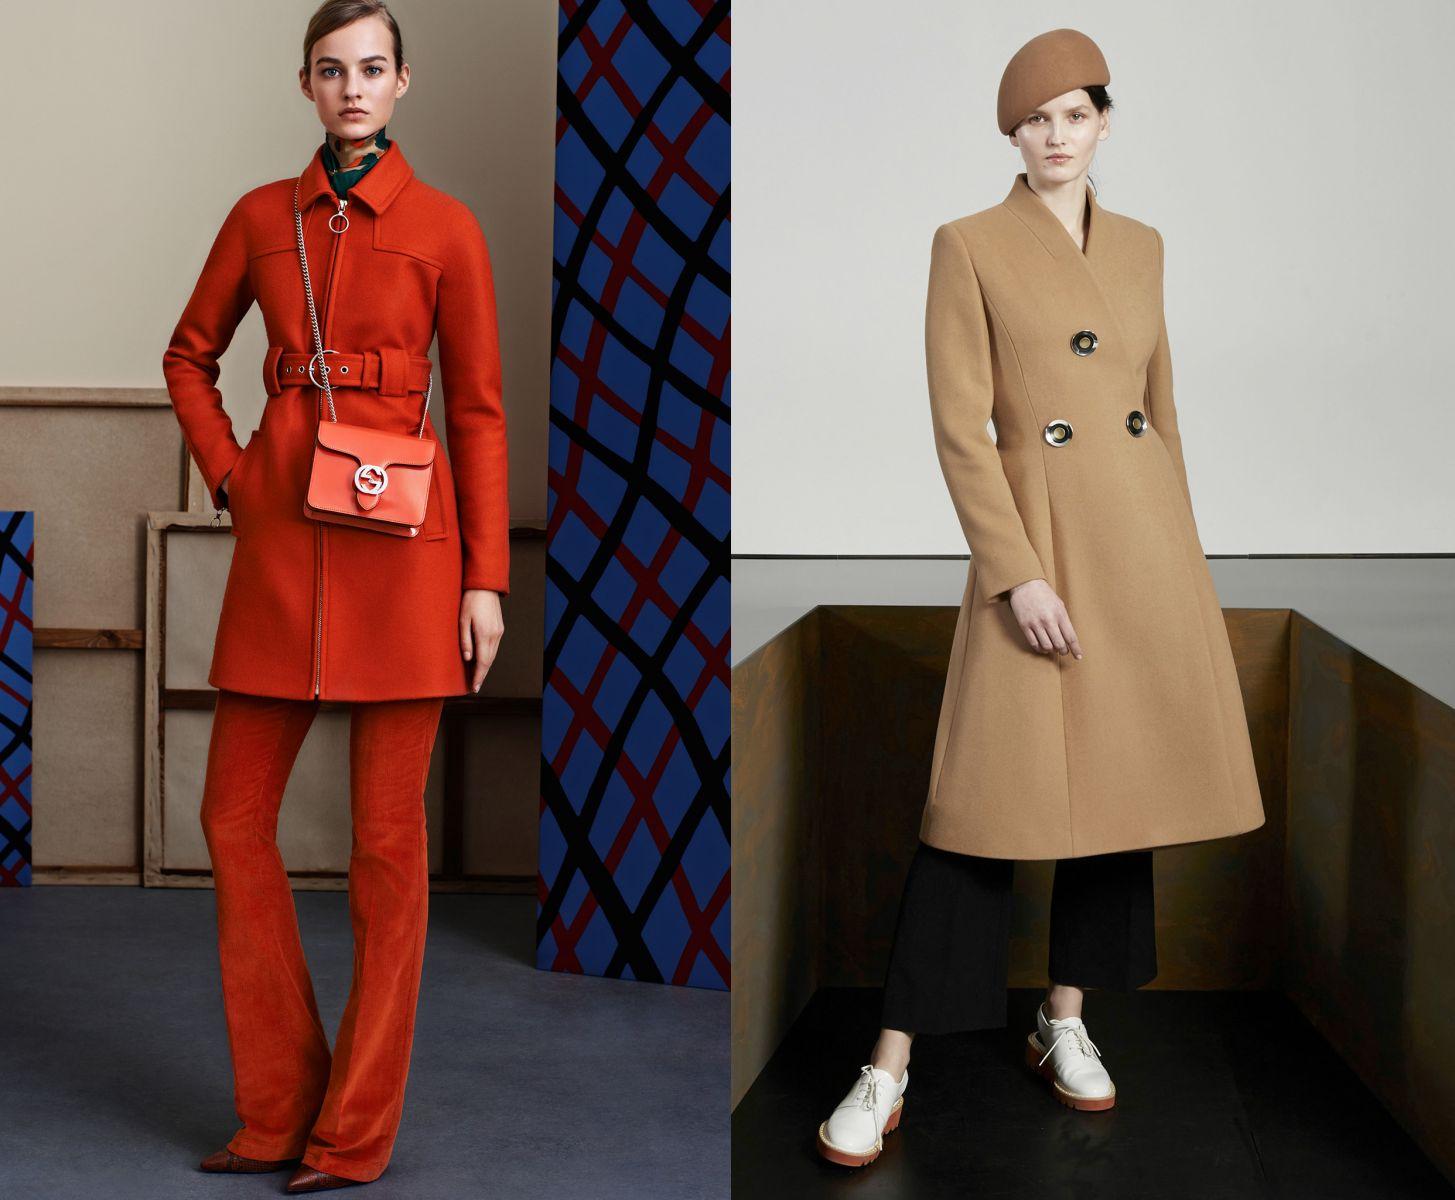 Что носить в 2015 году: тенденции pre-fall - фото №3